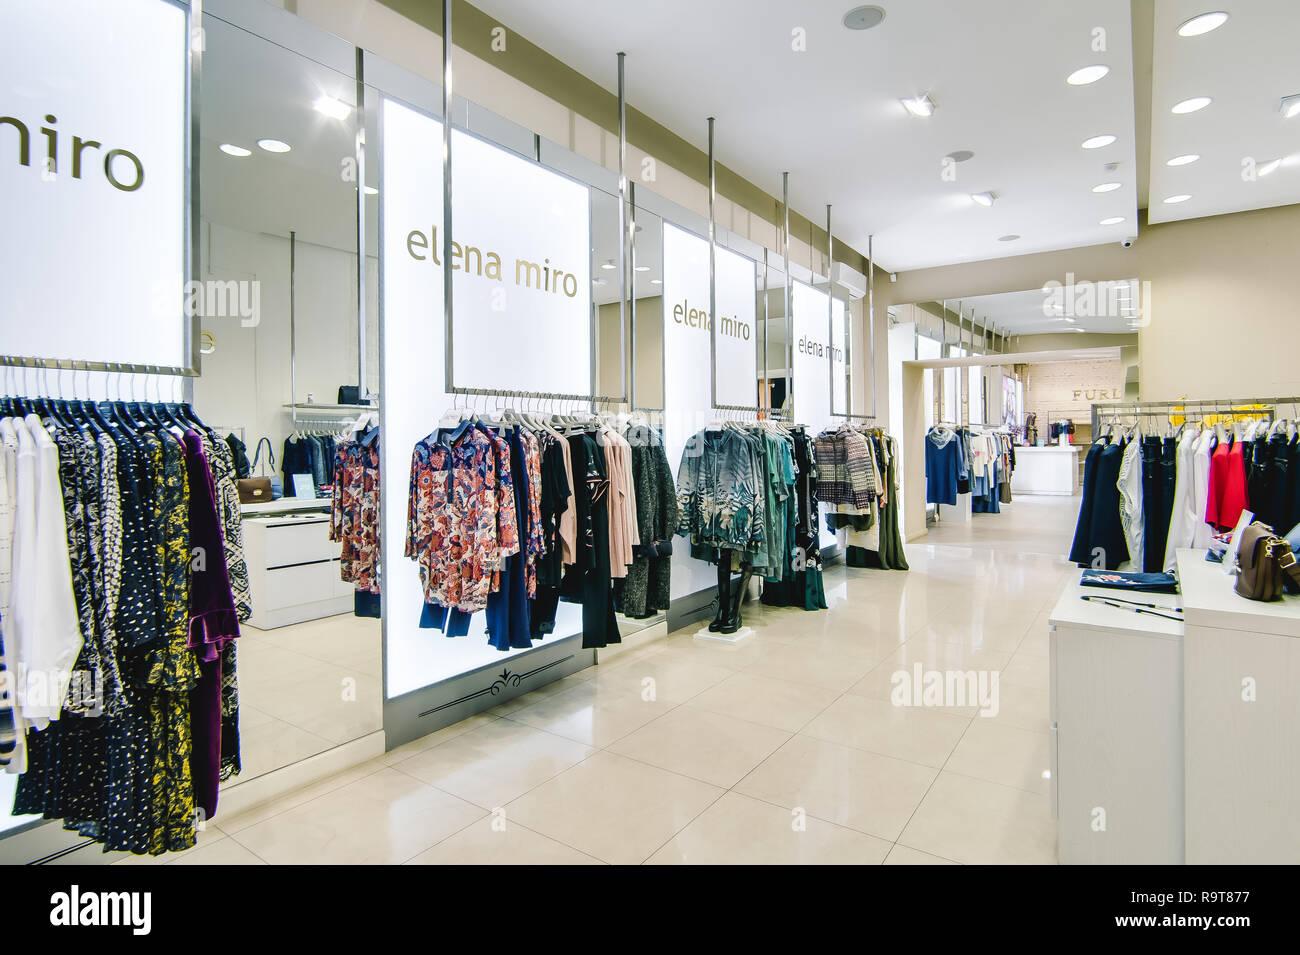 7b6edc8f9d72 Russia, Novosibirsk - April 25, 2018: interior of women's clothing and  accessories store boutique EMPORIO · Evgeniy Kleymenov / Alamy Stock Photo